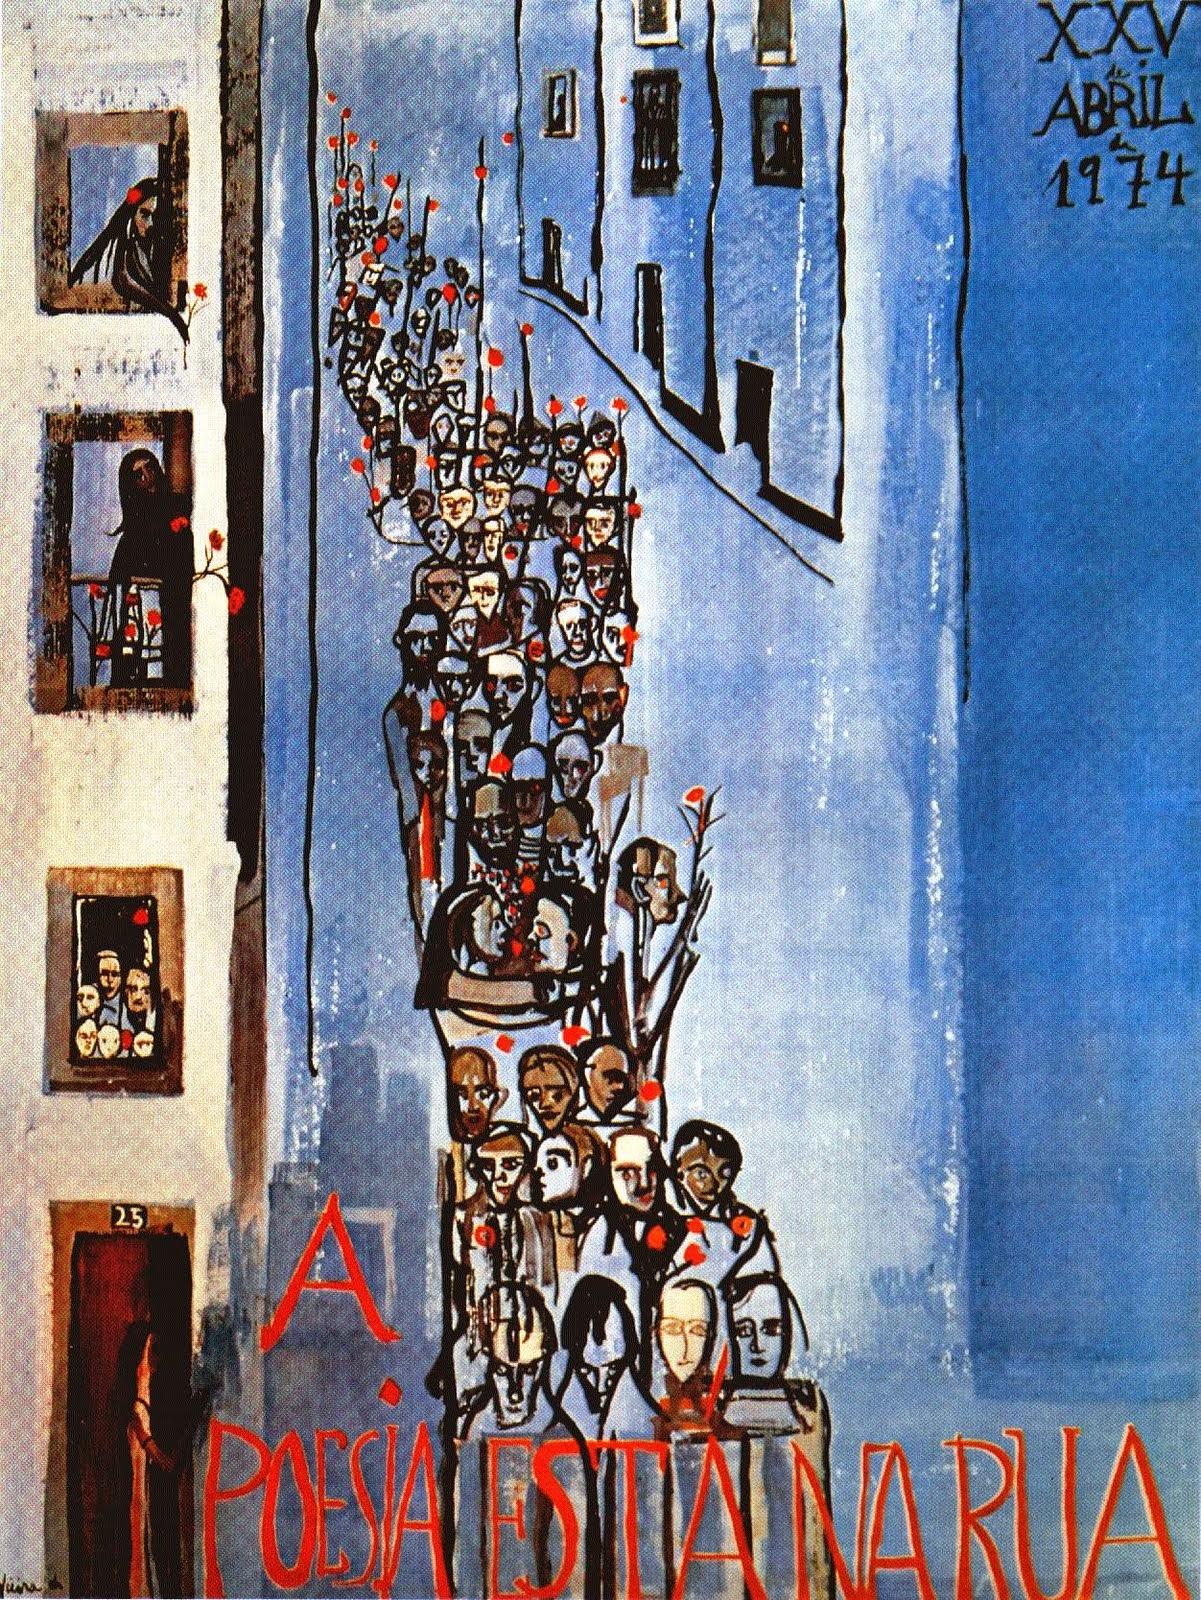 A Poesia Está na Rua, 25 de Abril de 1974, Cartaz Vieira da Silva